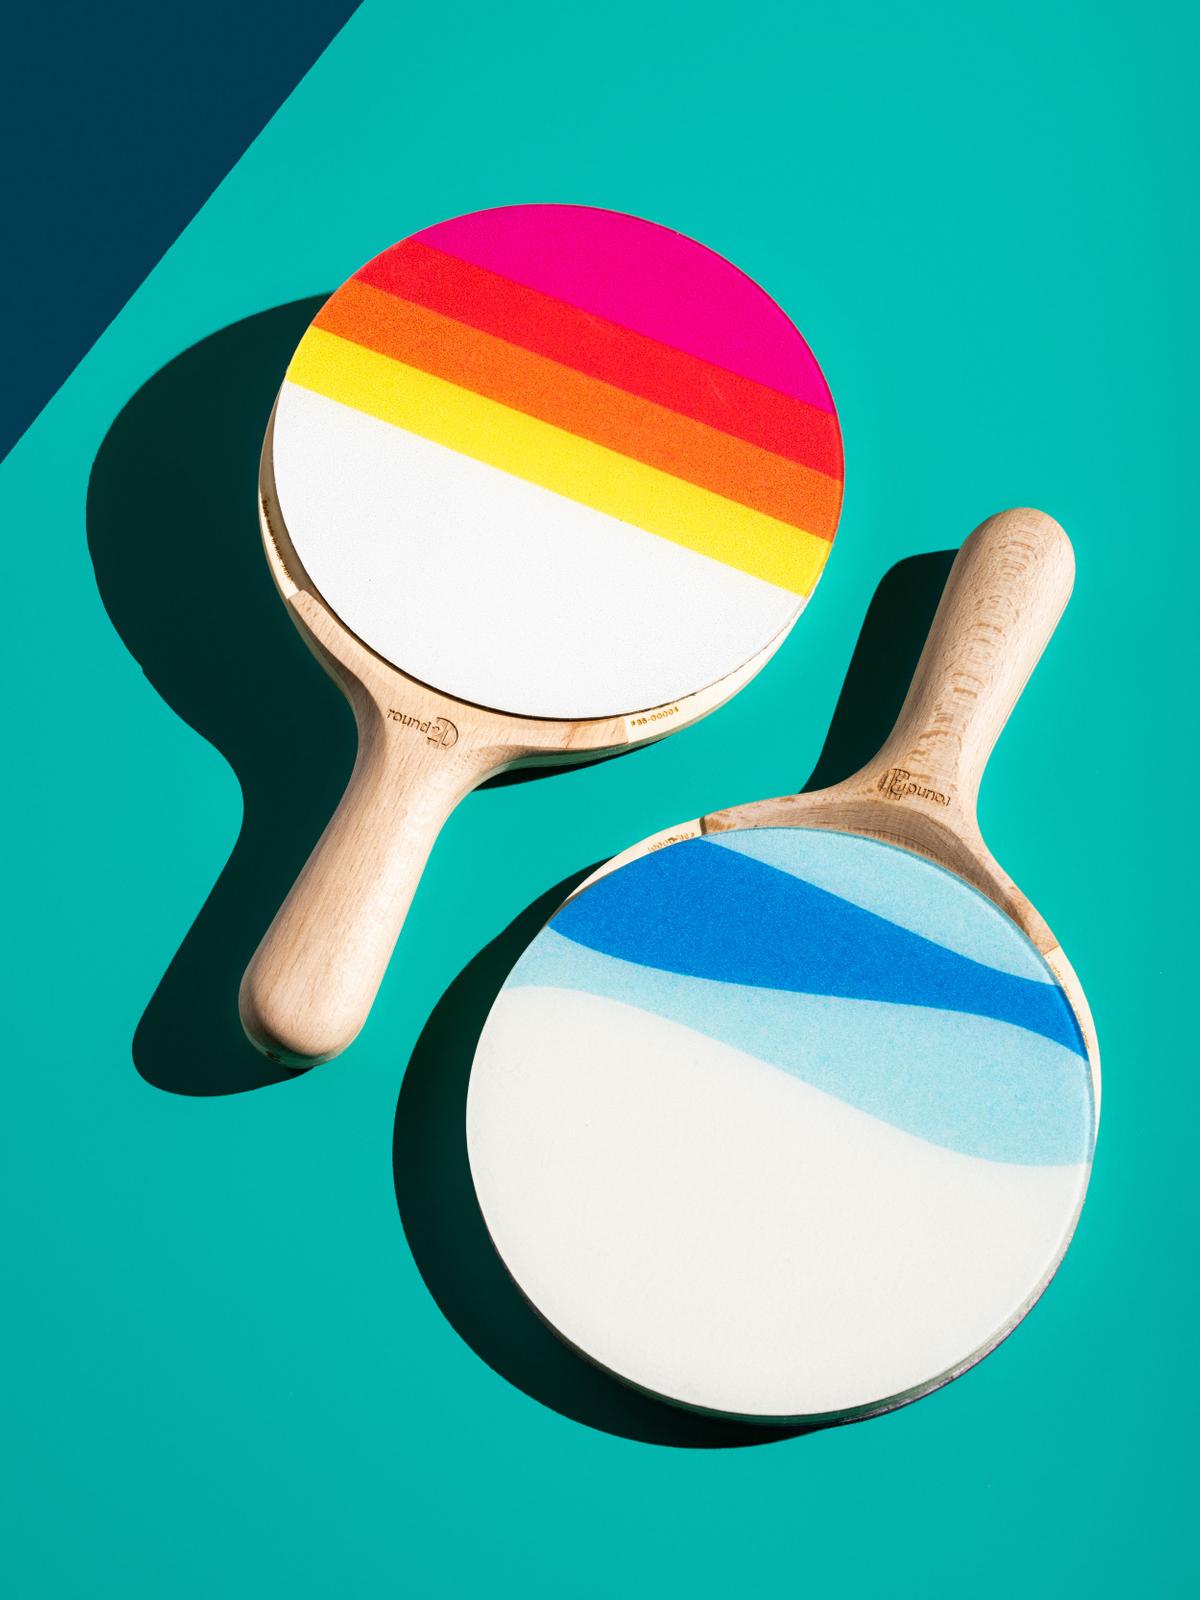 colorful ping pong paddles